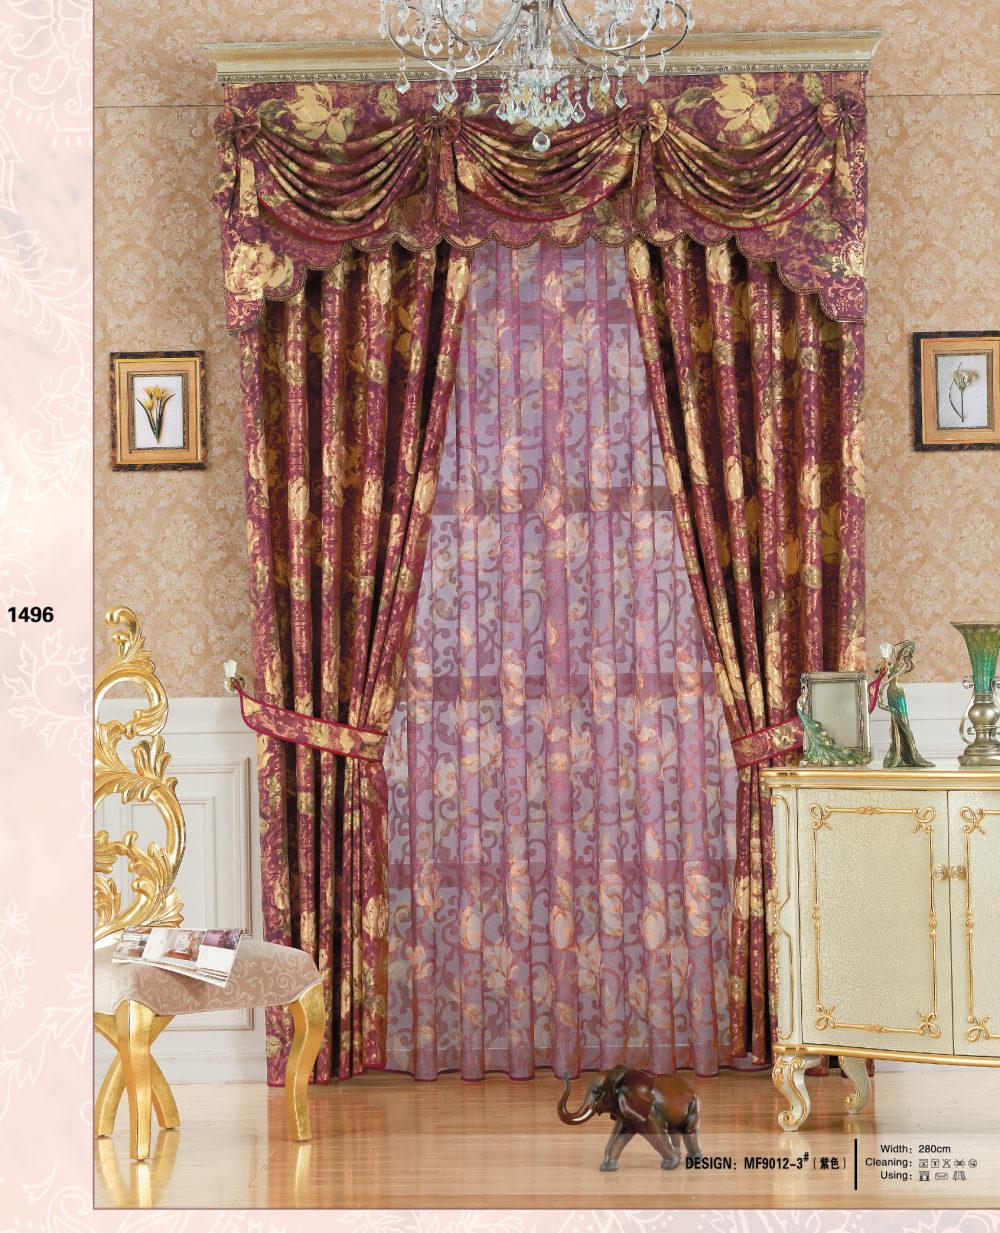 Aiden 收藏窗帘图片高清图(用方案里很清晰。)免费~_8.jpg